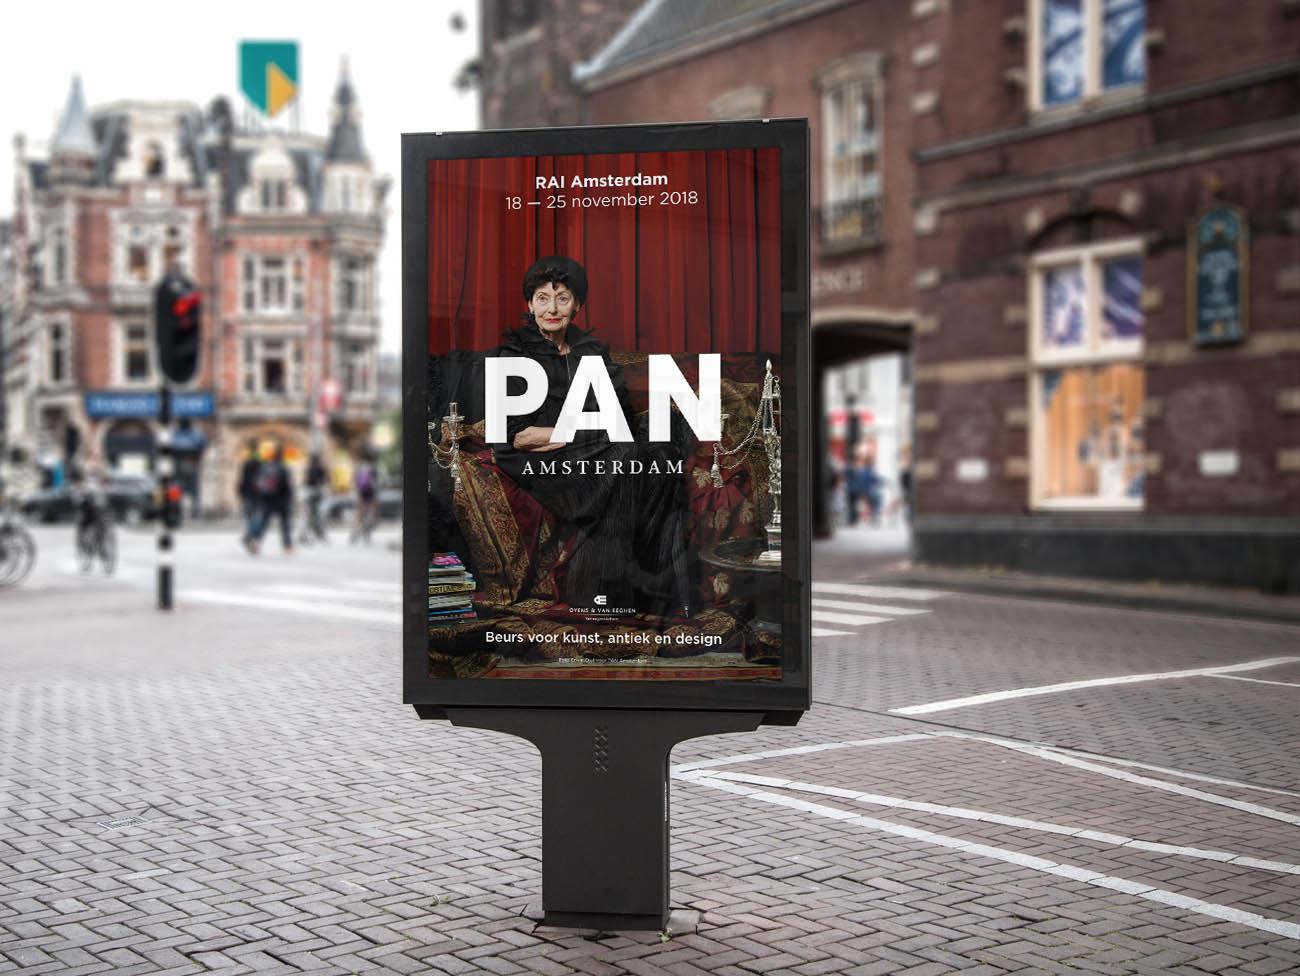 pan2018-1300x976-billboard-01